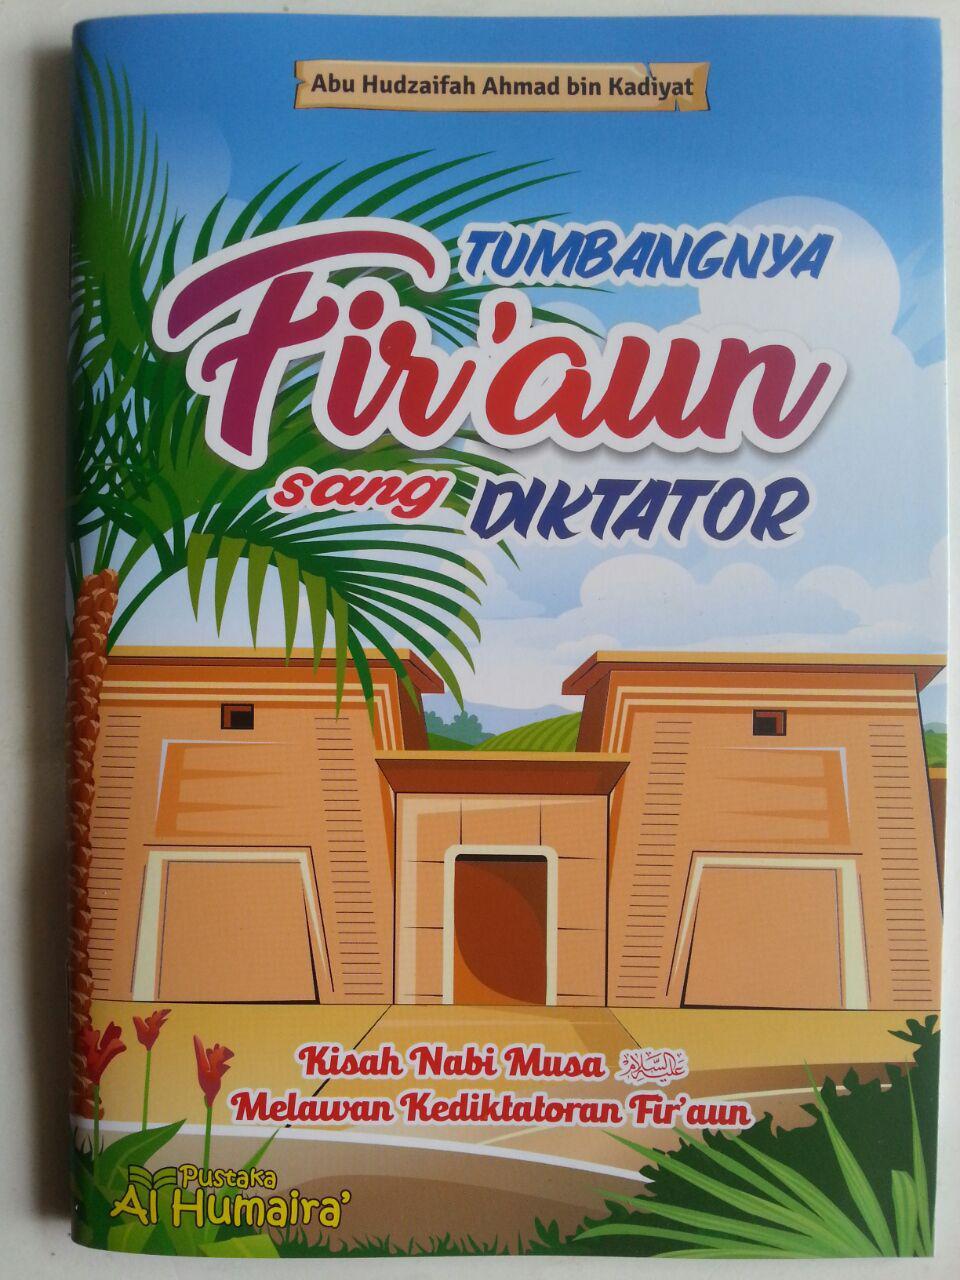 Buku Anak Tumbangnya Firaun Sang Diktator cover 2